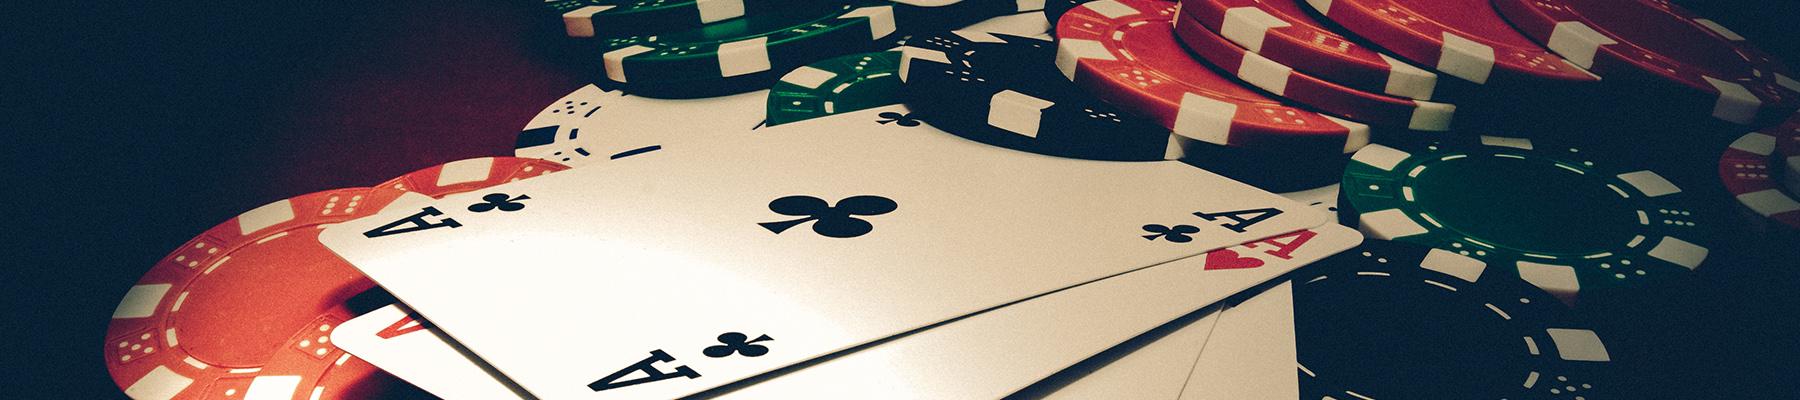 Casinoinsats